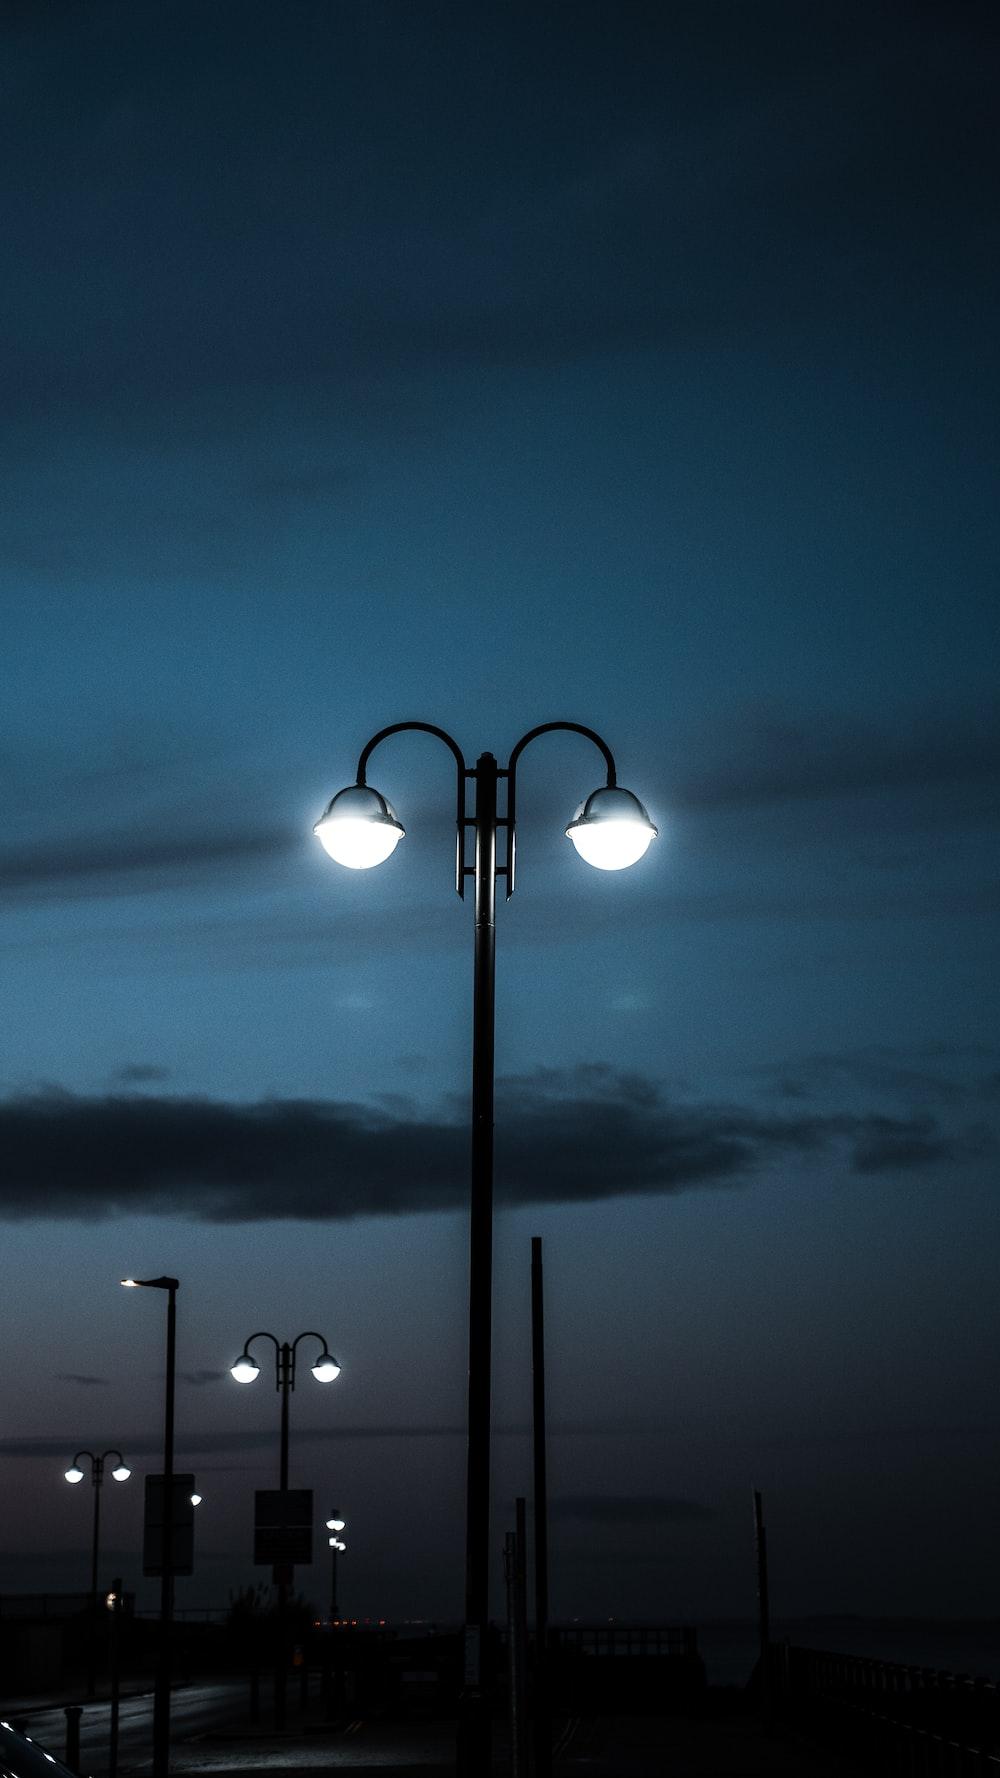 black metal framed light post during night time